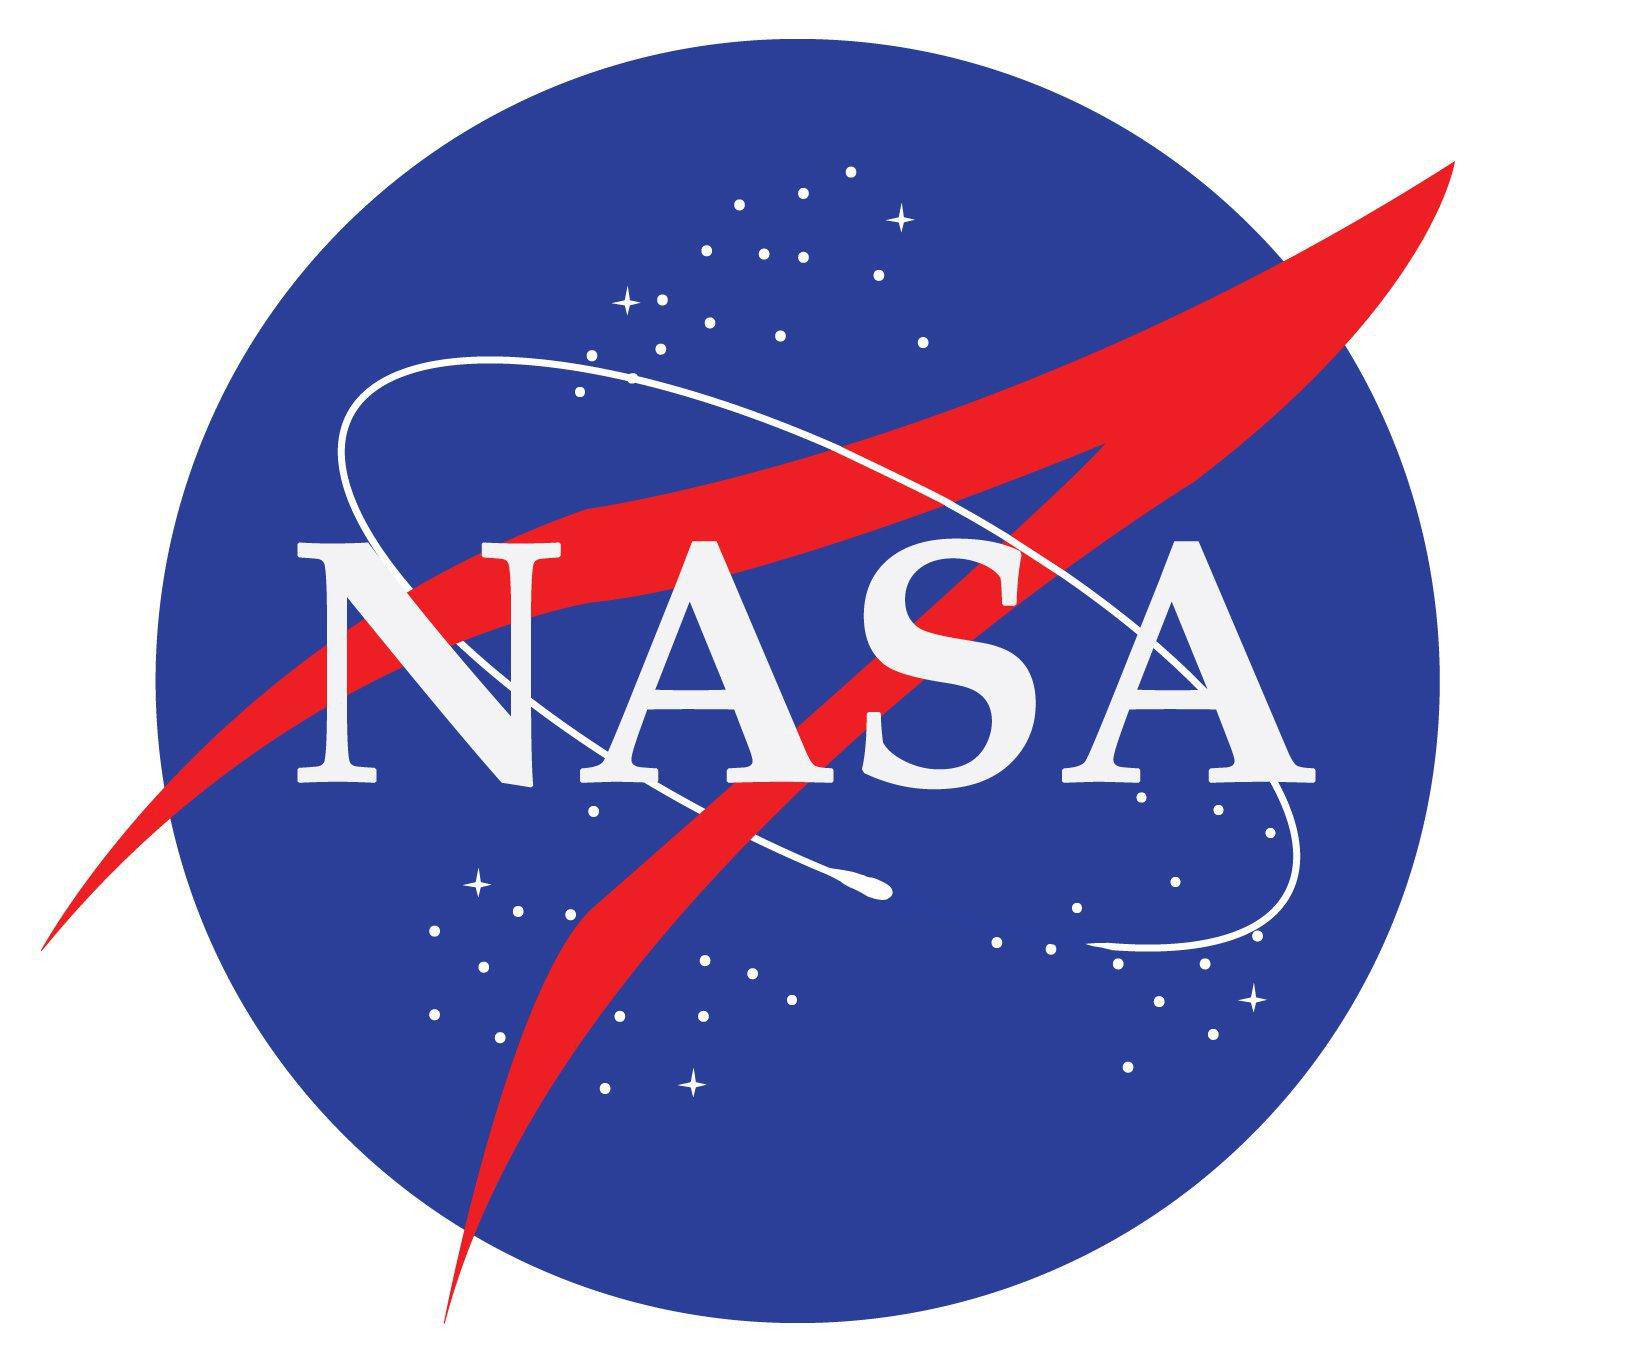 NASA: Reise zum Mars im Mai 2018 - gratis